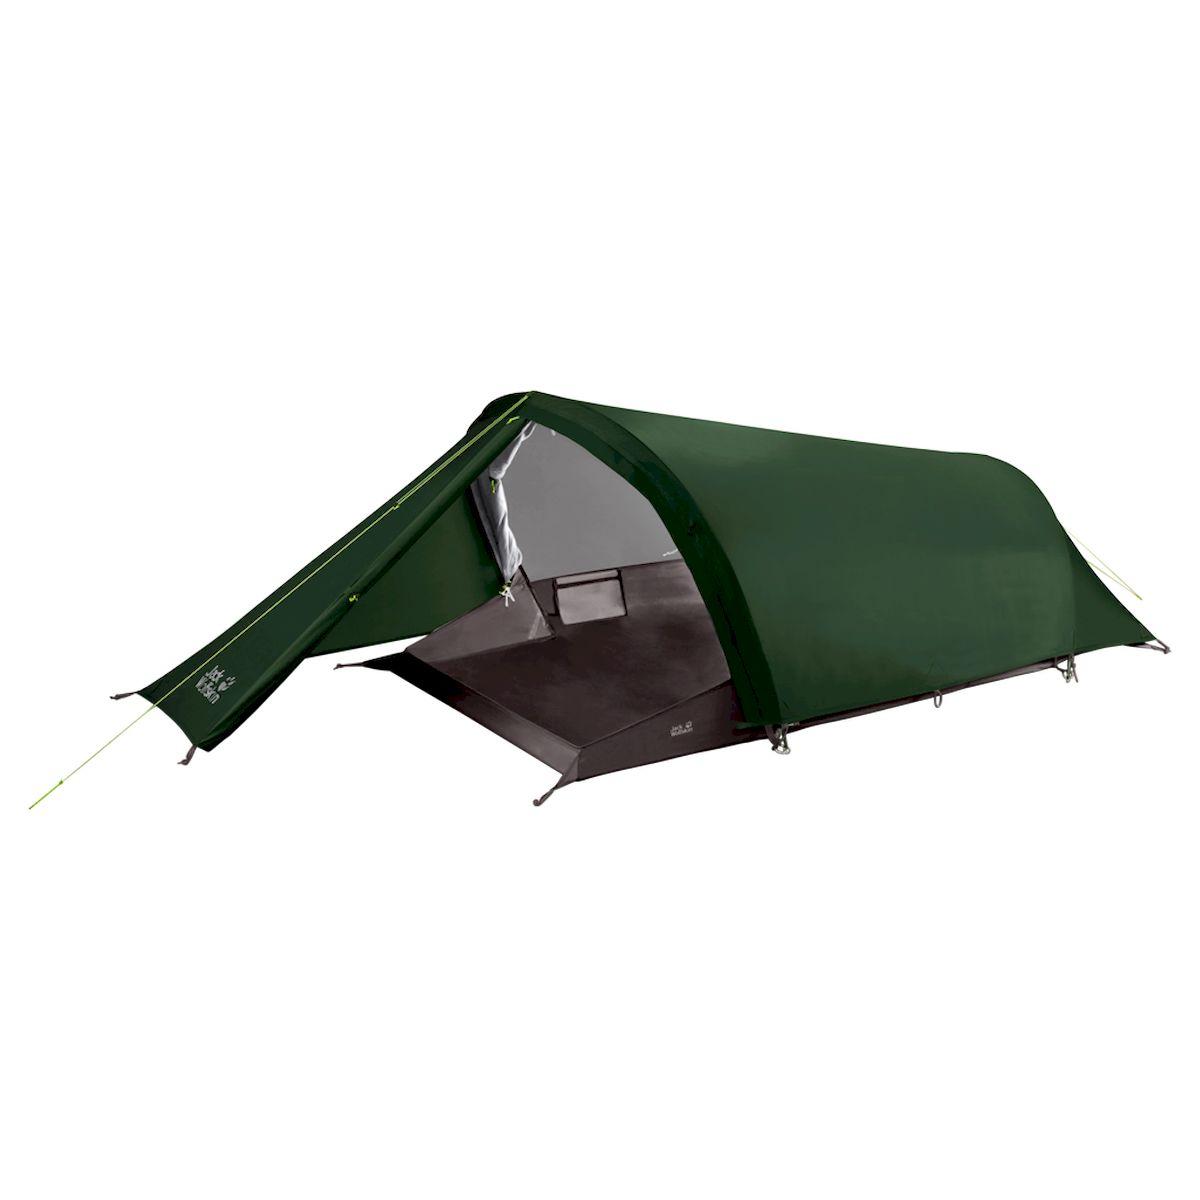 Палатка Jack Wolfskin Gossamer II, 3003641-4502, темно-зеленый, 2-местная showy flowers printed gossamer long scarf